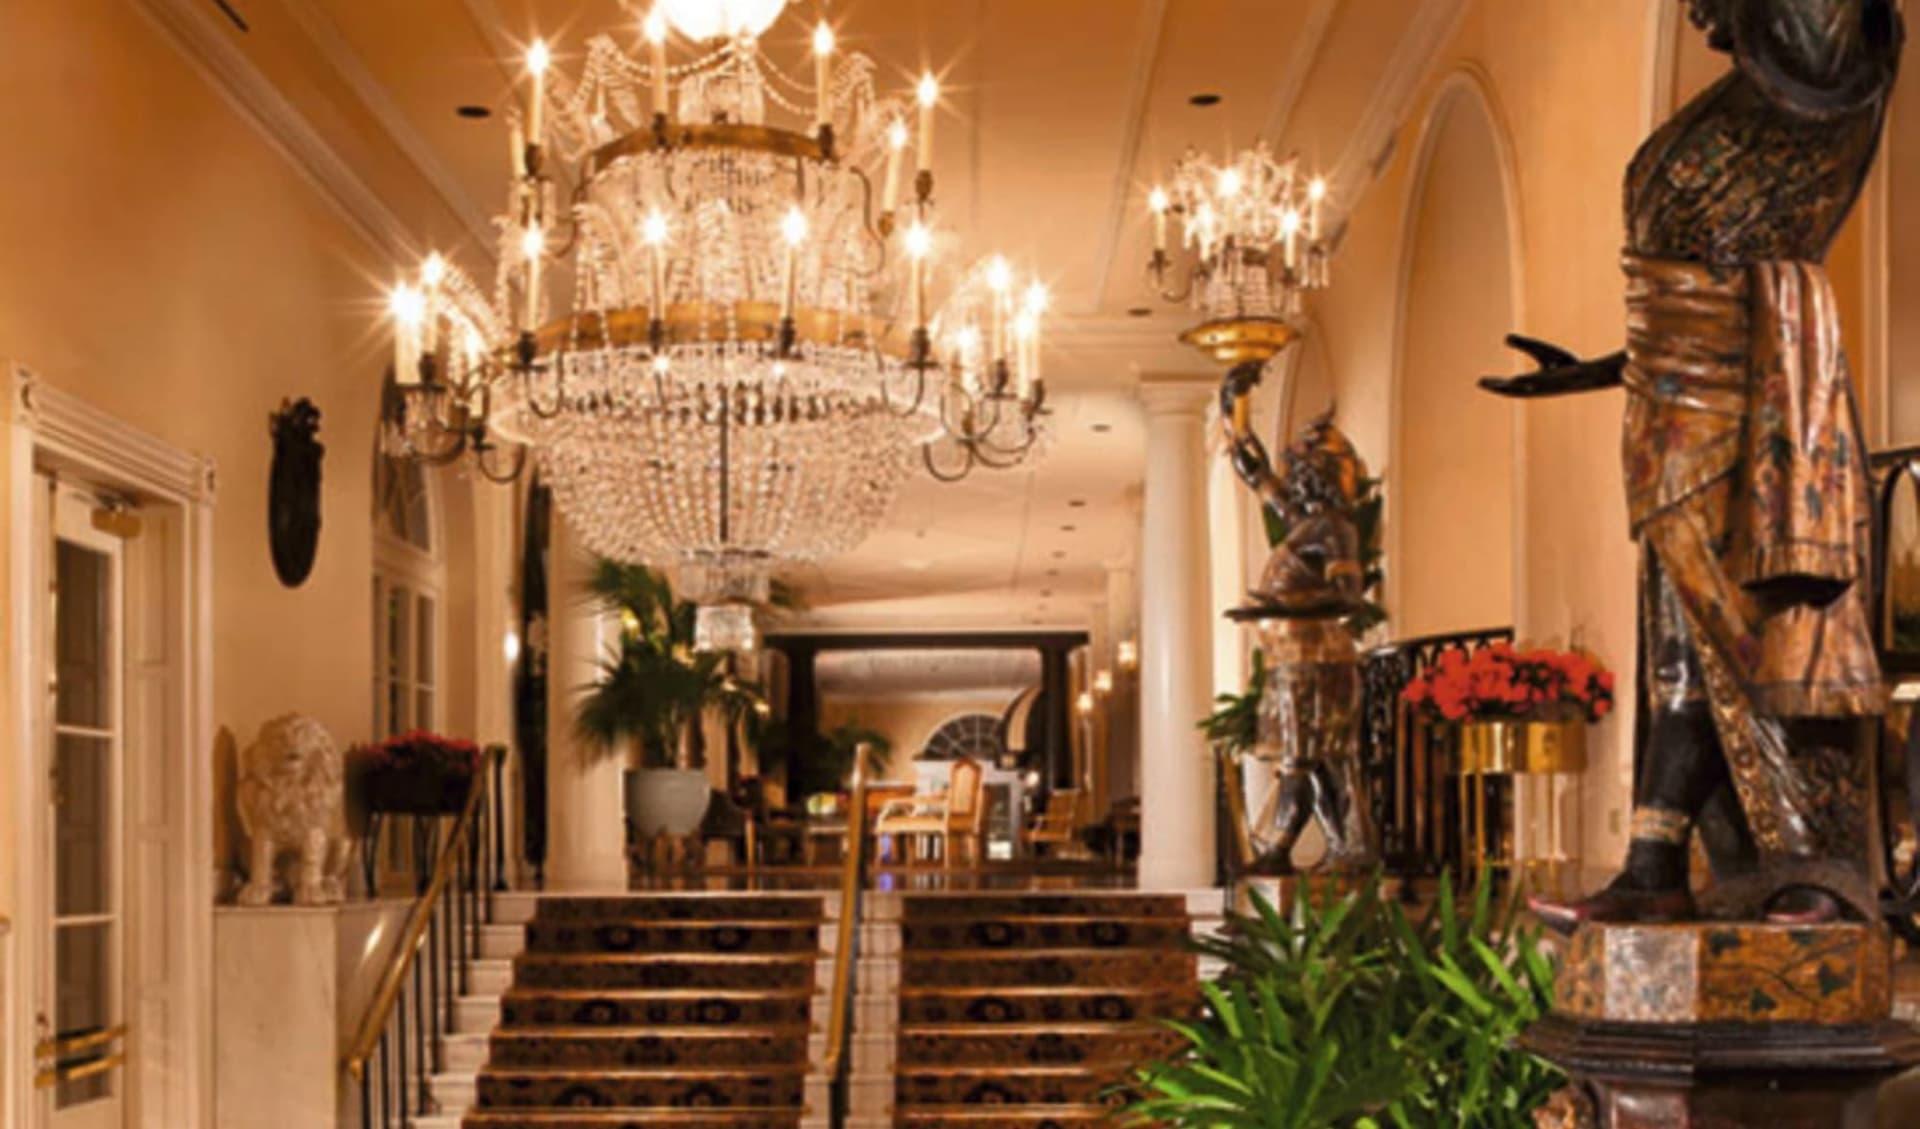 Omni Royal Orleans in New Orleans:  Omni Royal - Saal mit Treppe und Leuchter